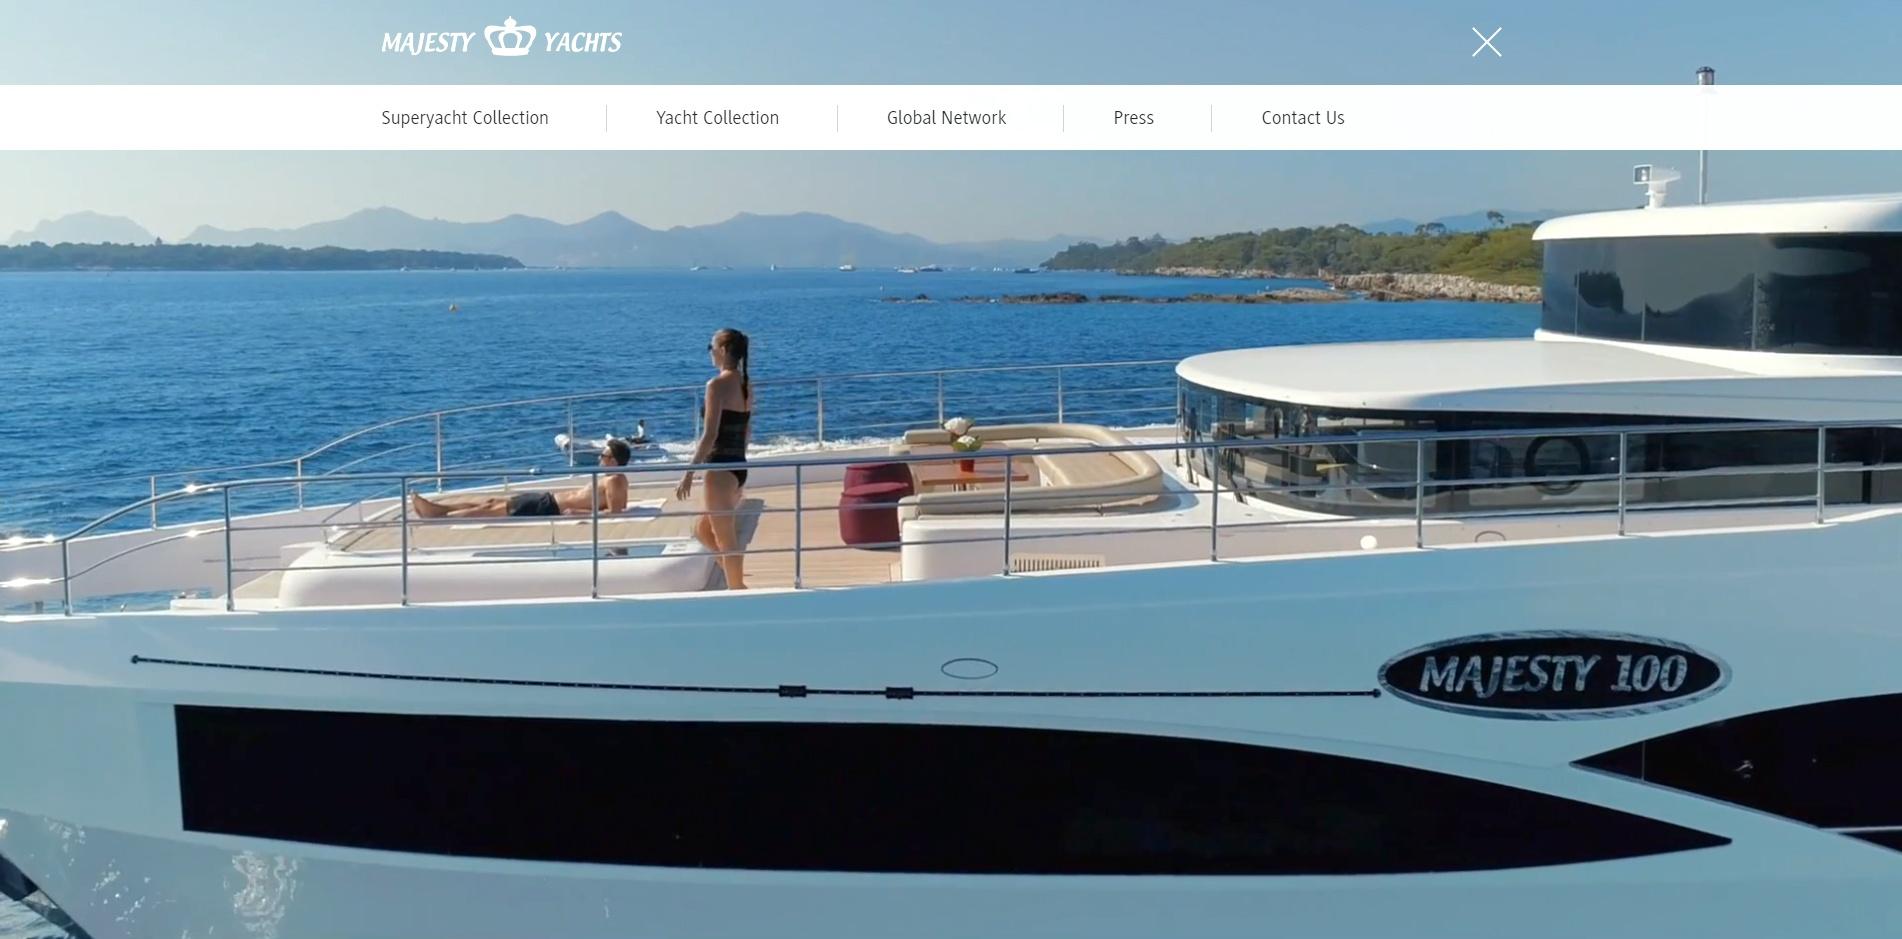 Majesty-Yachts-website-screenshot-1